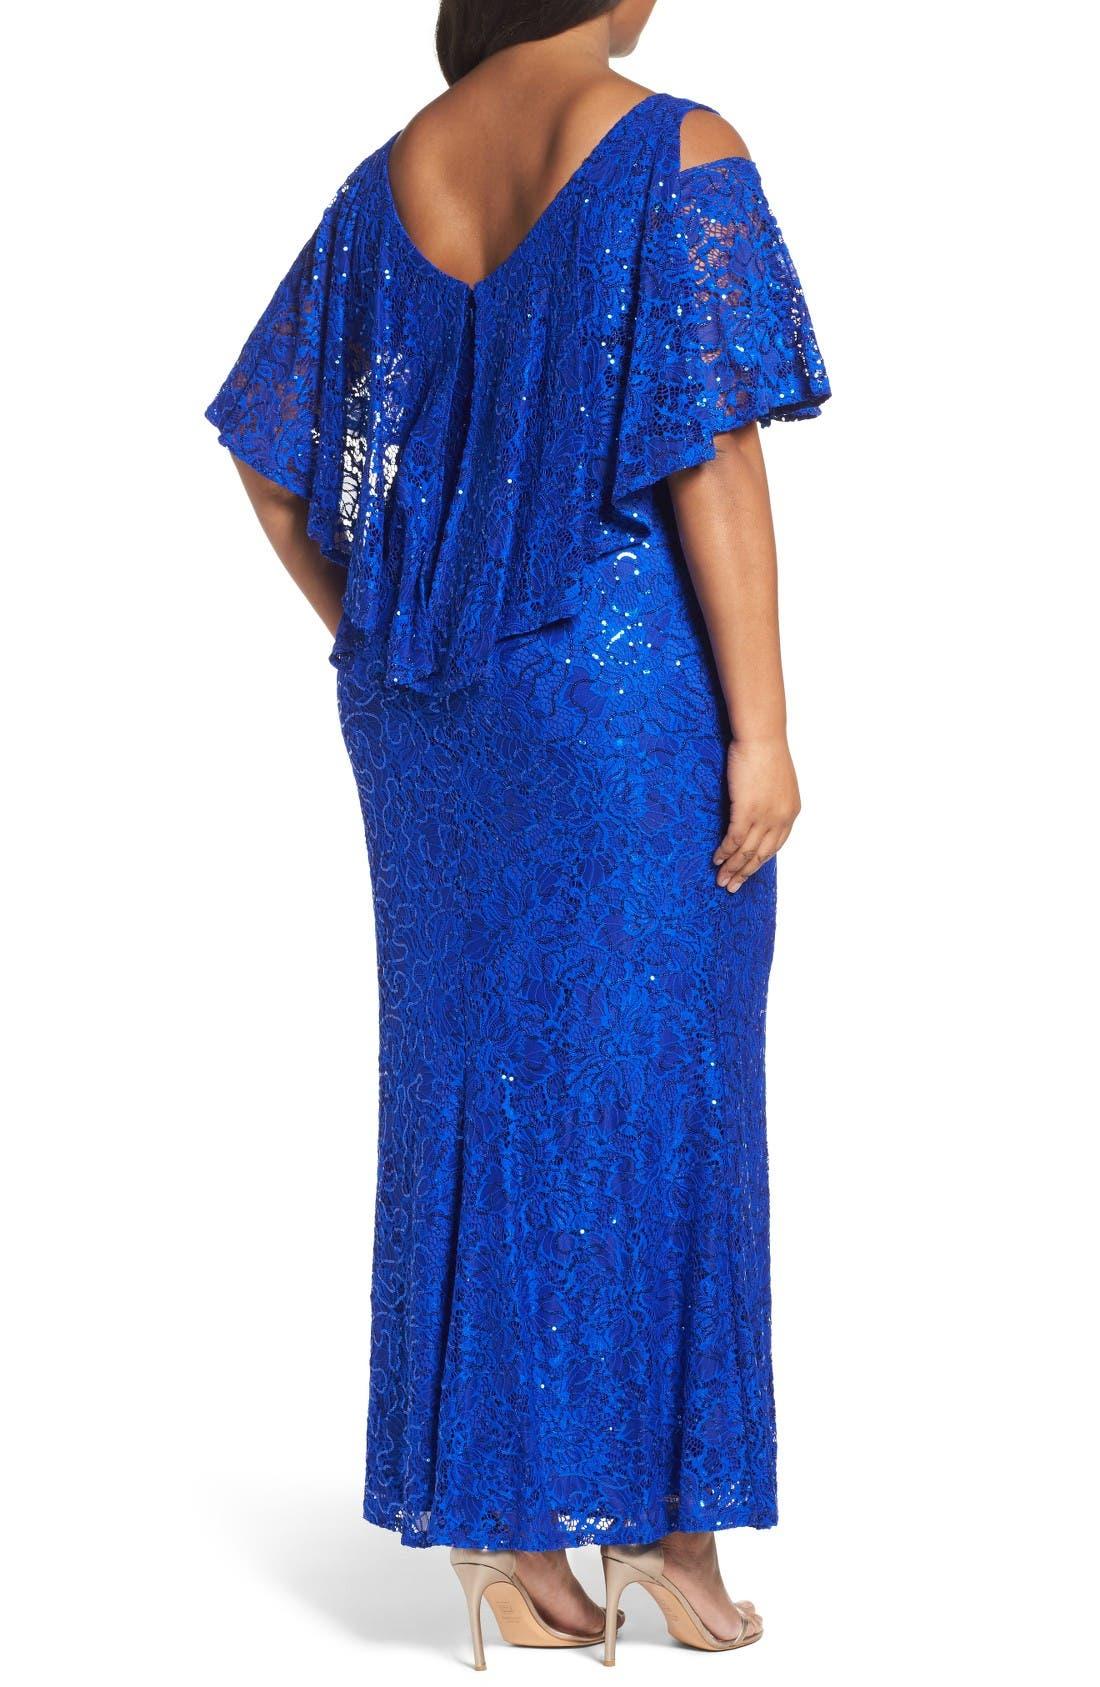 Alternate Image 2  - Marina Sequin Lace Cold Shoulder Long Dress (Plus Size)